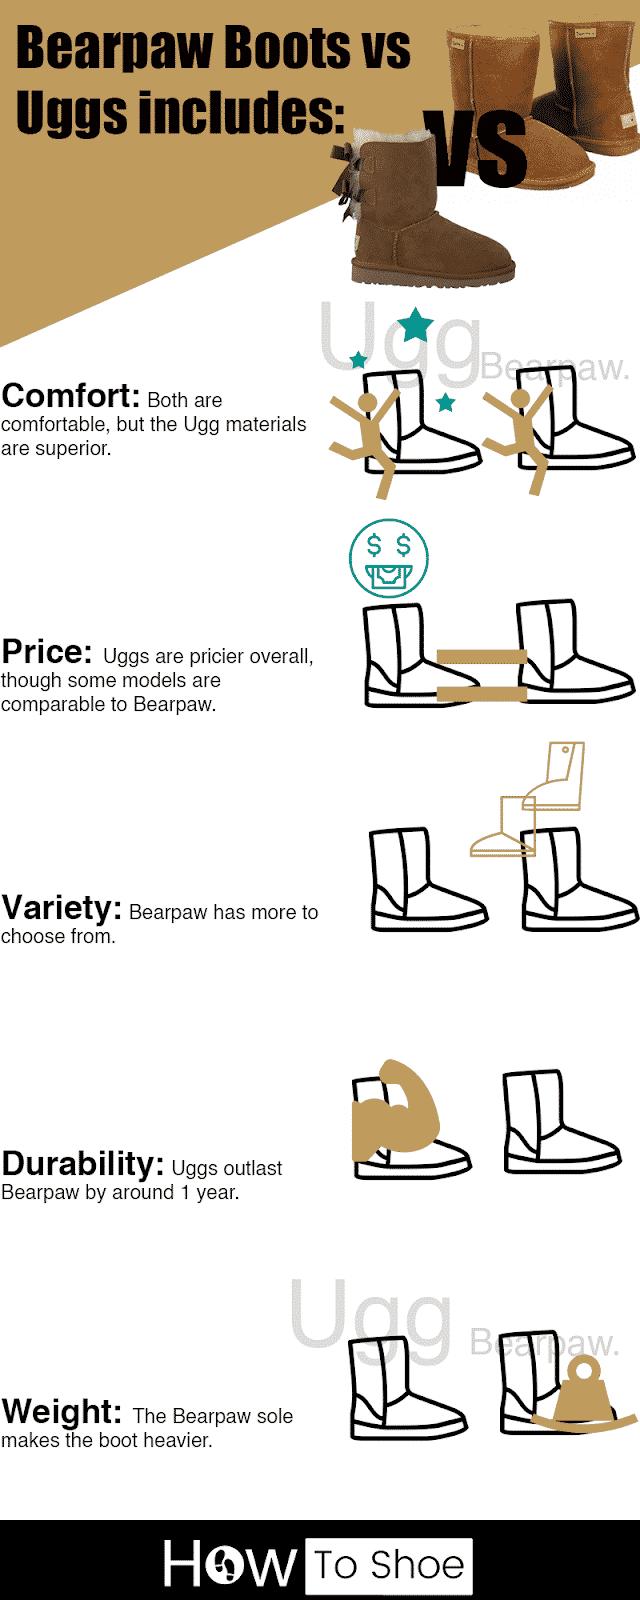 Bearpaw boots vs uggs